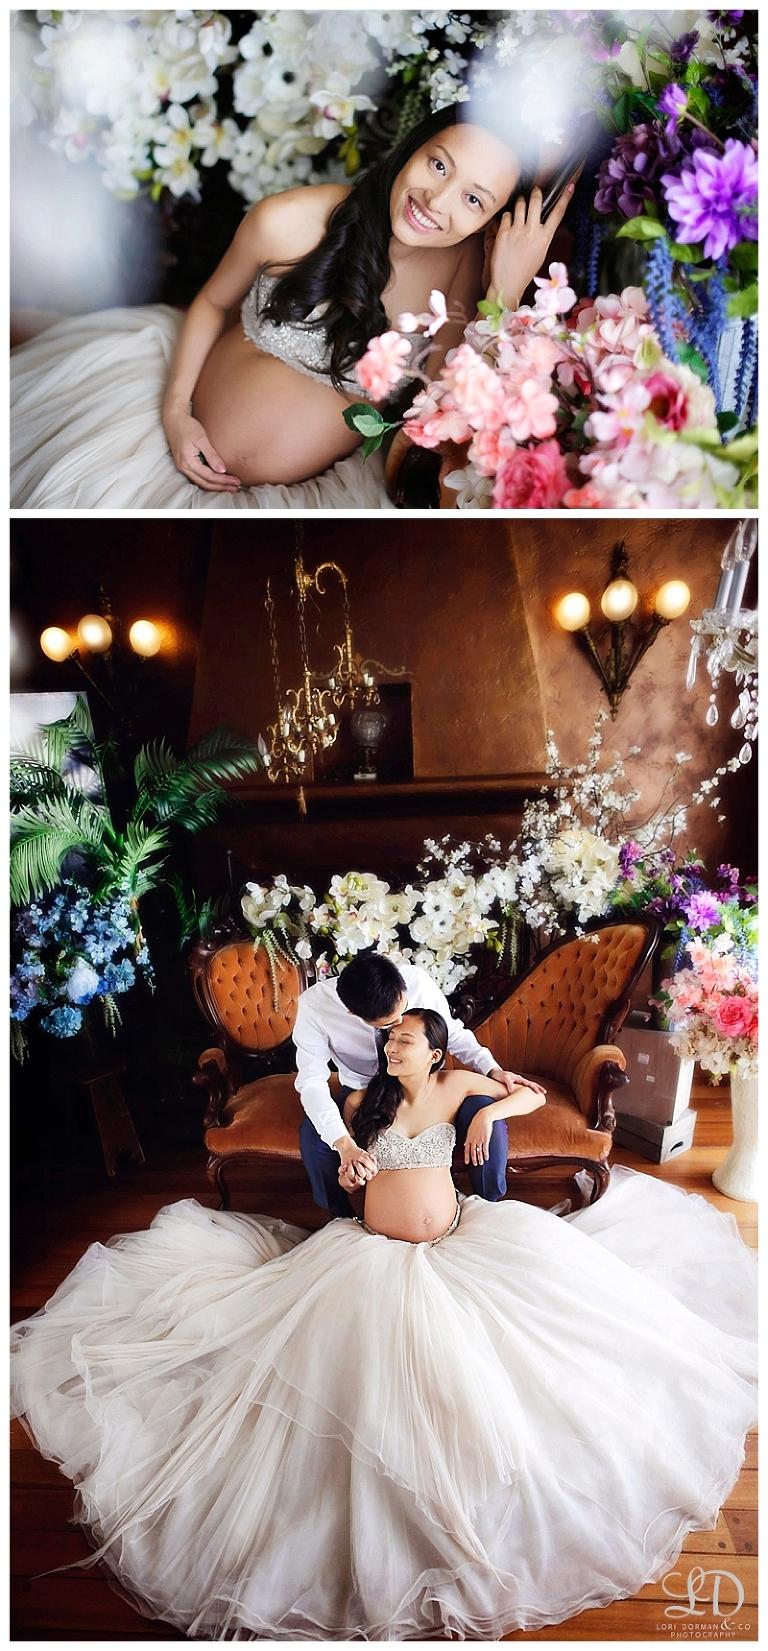 sweet maternity photoshoot-lori dorman photography-maternity boudoir-professional photographer_4191.jpg